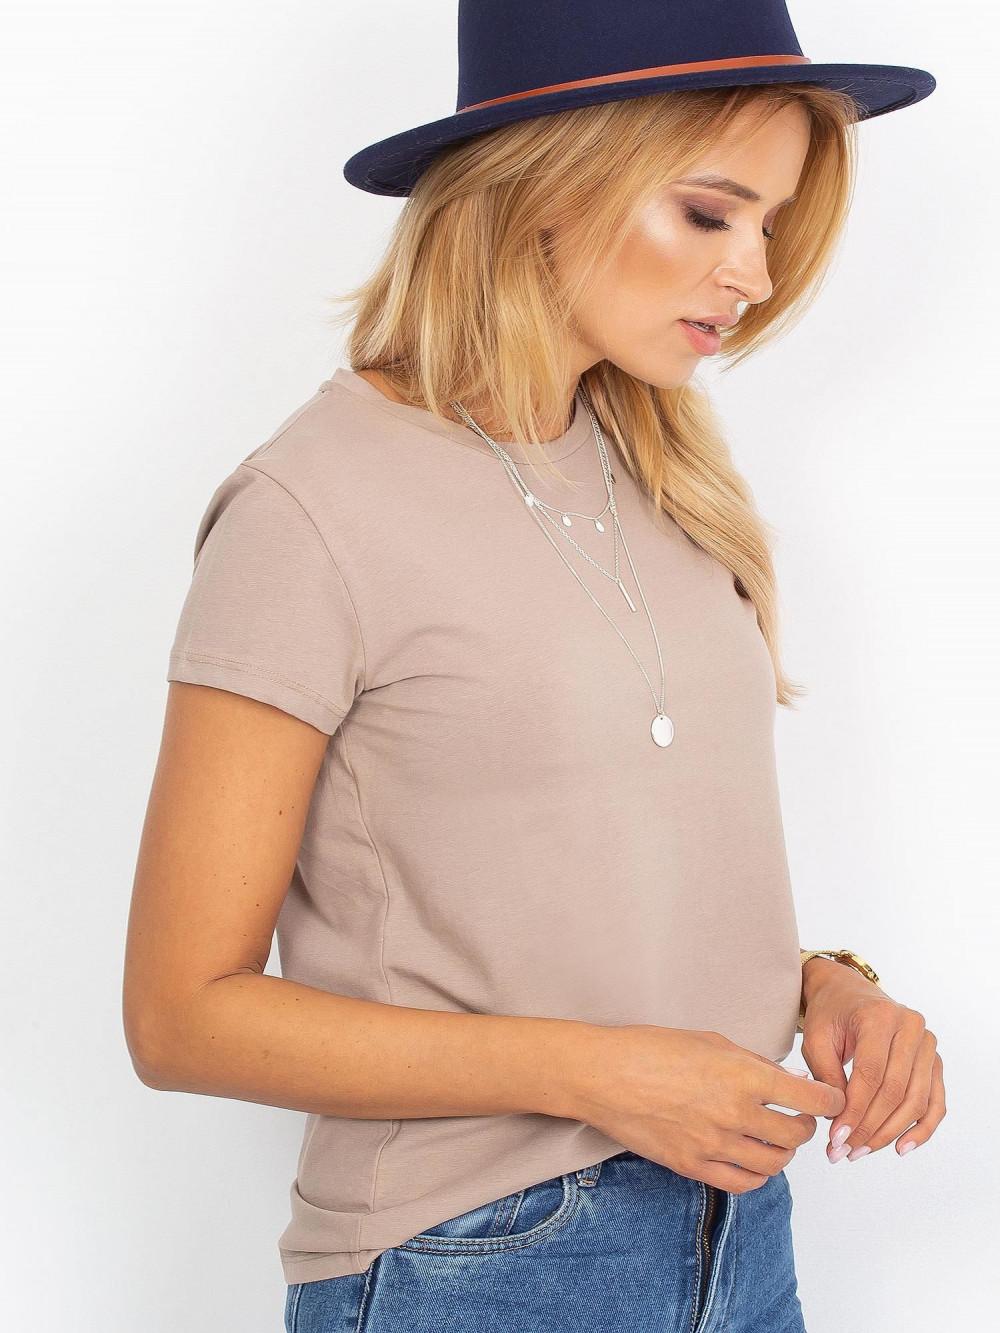 Ciemnobeżowy t-shirt O-Neck Esma 2